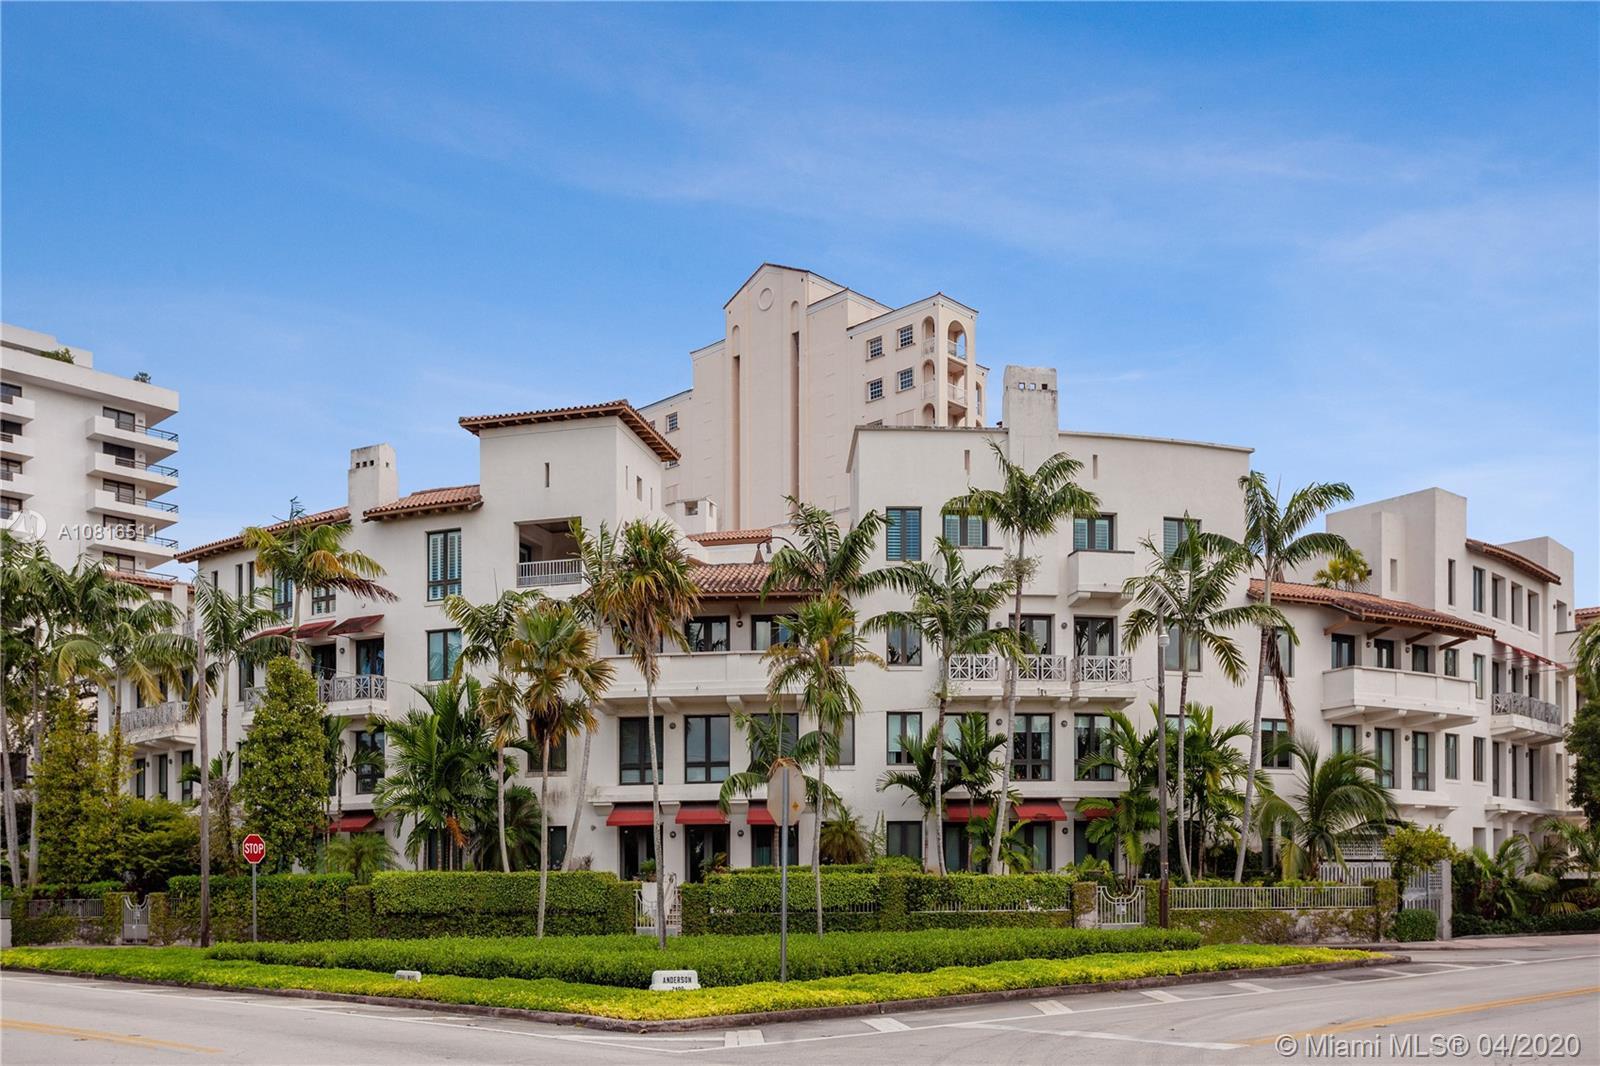 2401 Anderson Rd, 2 - Coral Gables, Florida